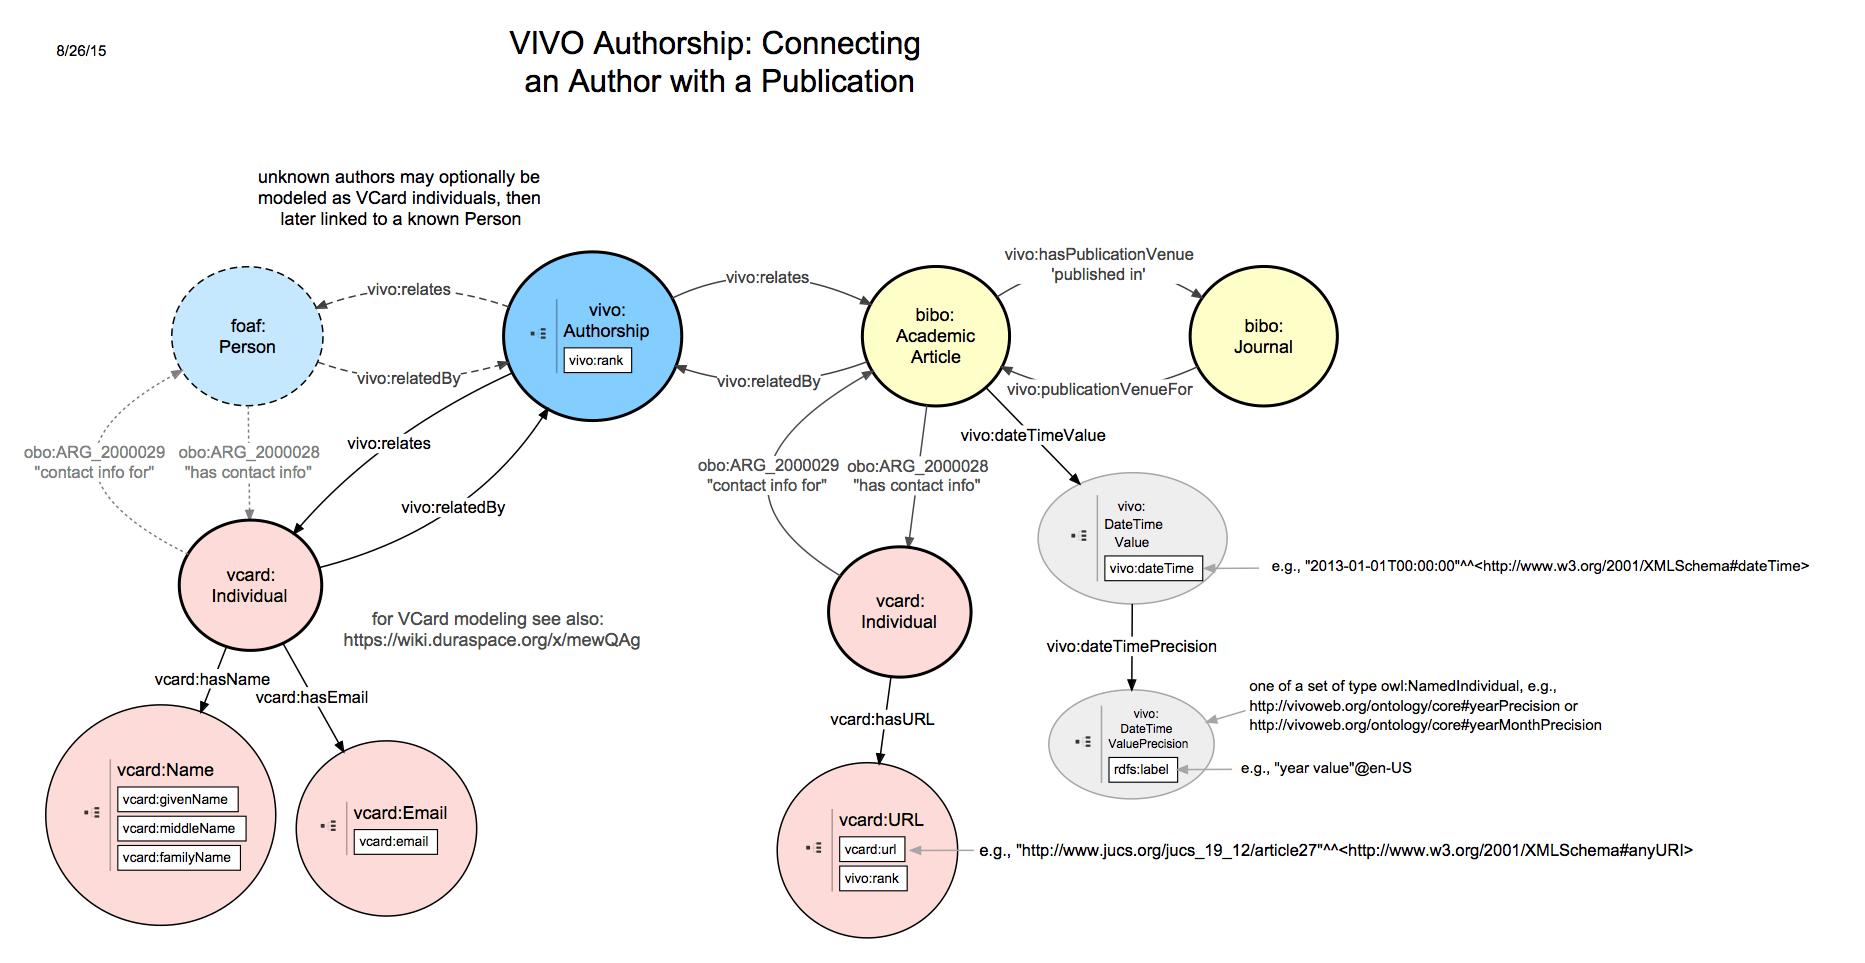 VIVOISF 16 relationship diagrams: Authorship  VIVO Technical Documentation Archive